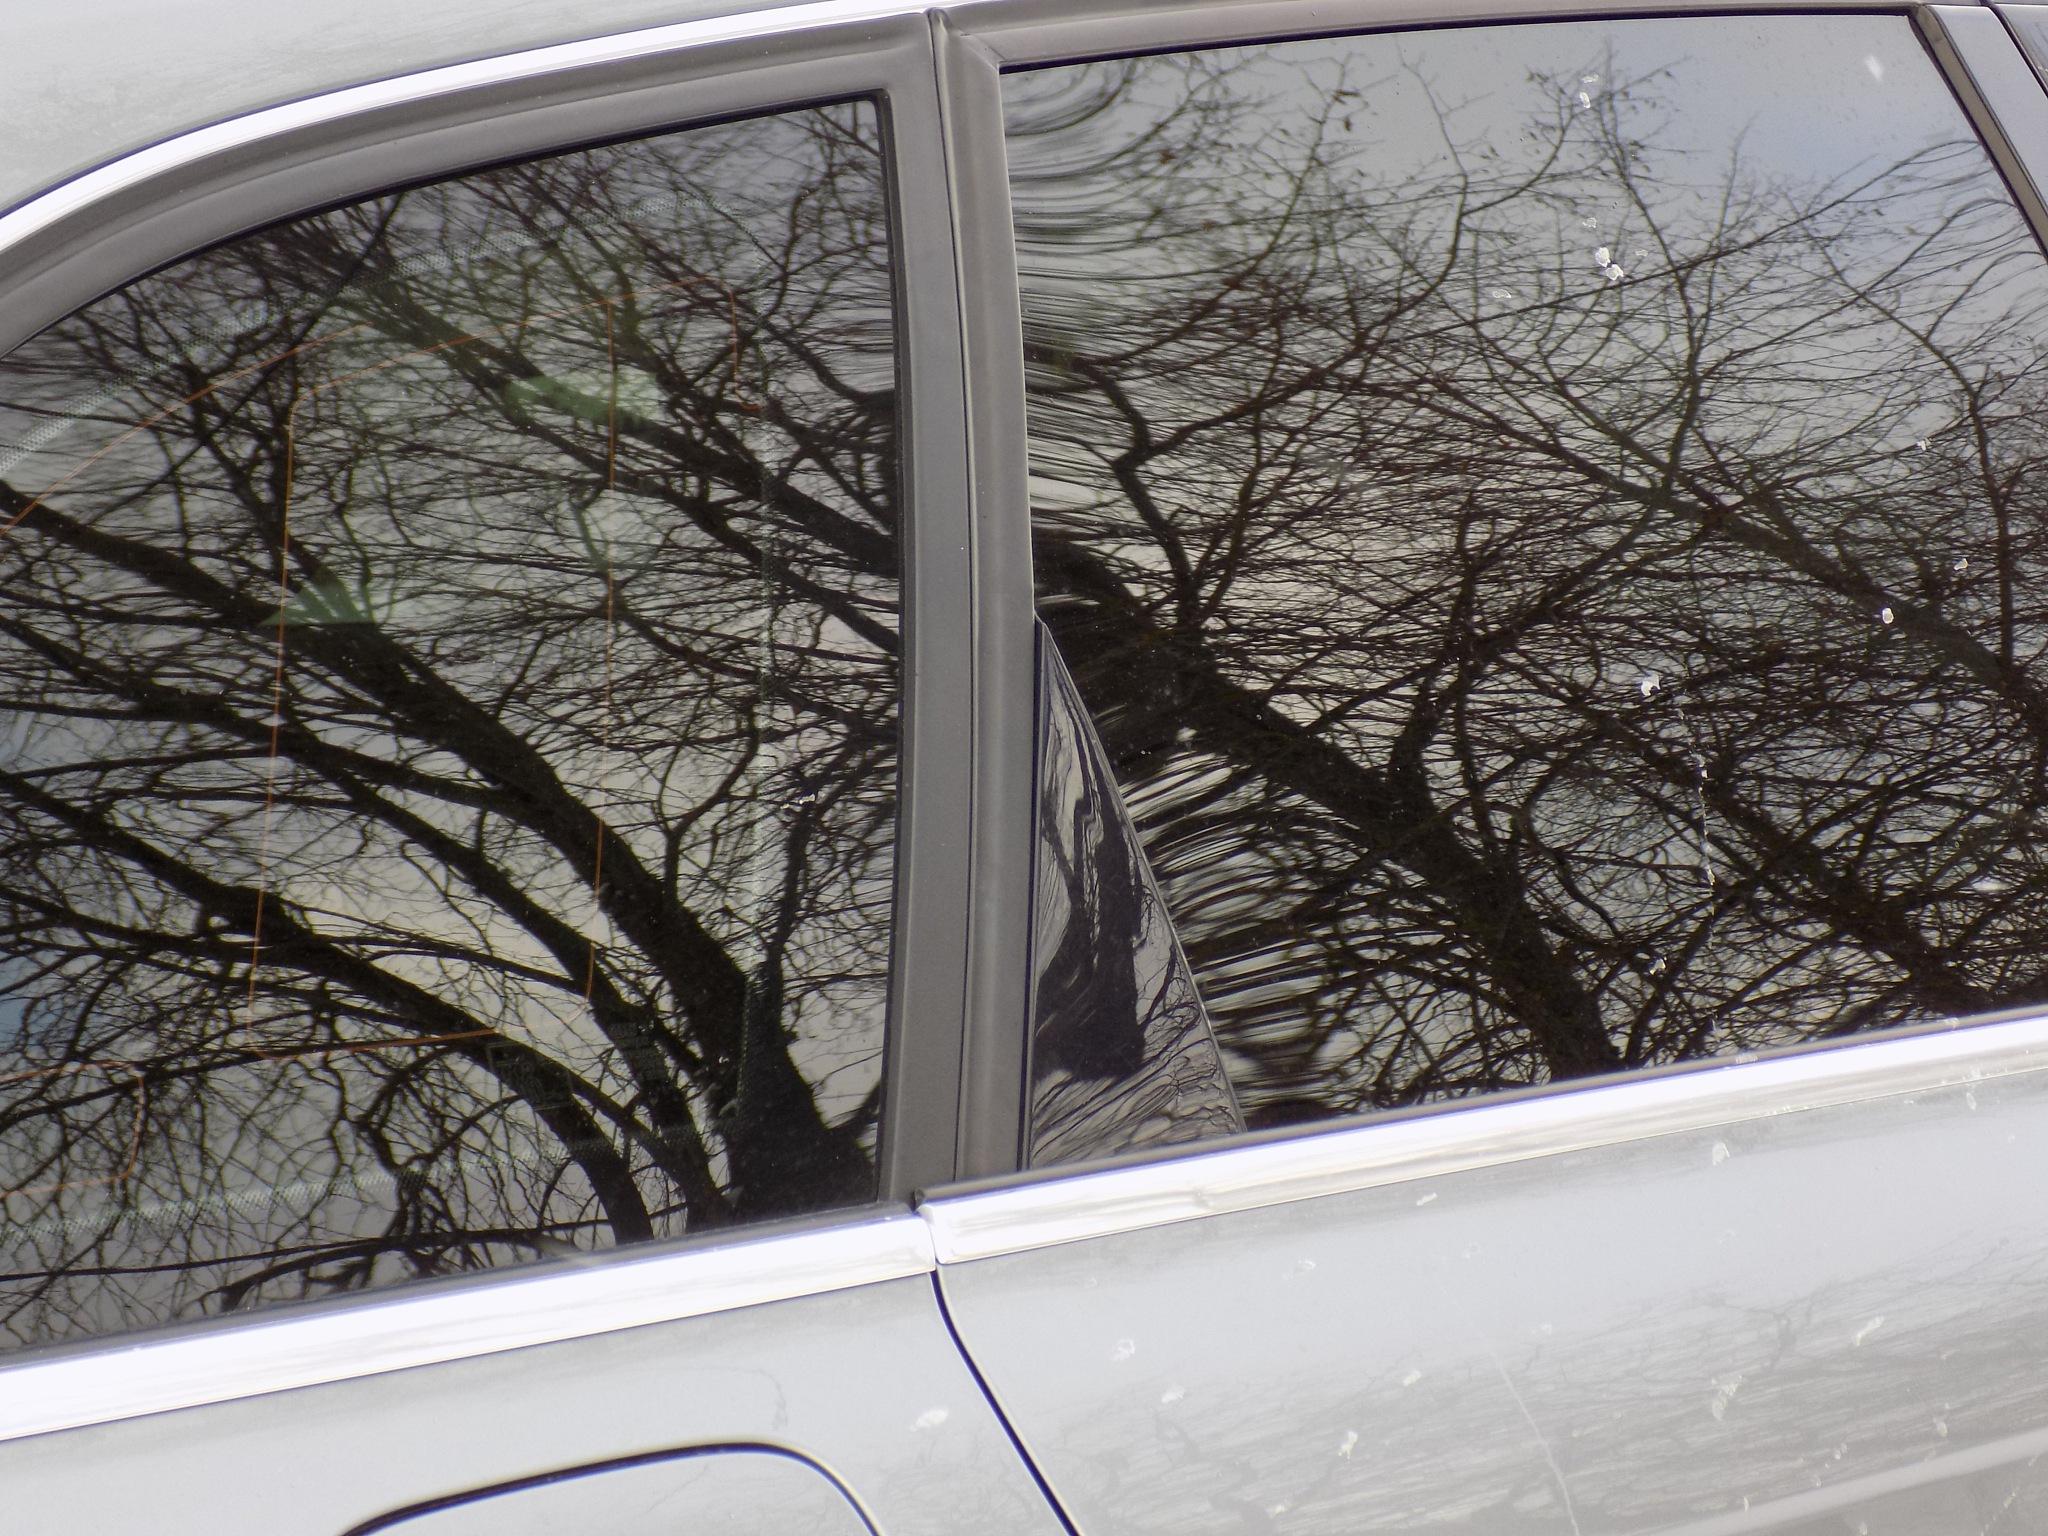 Reflects on car window by uzkuraitiene62